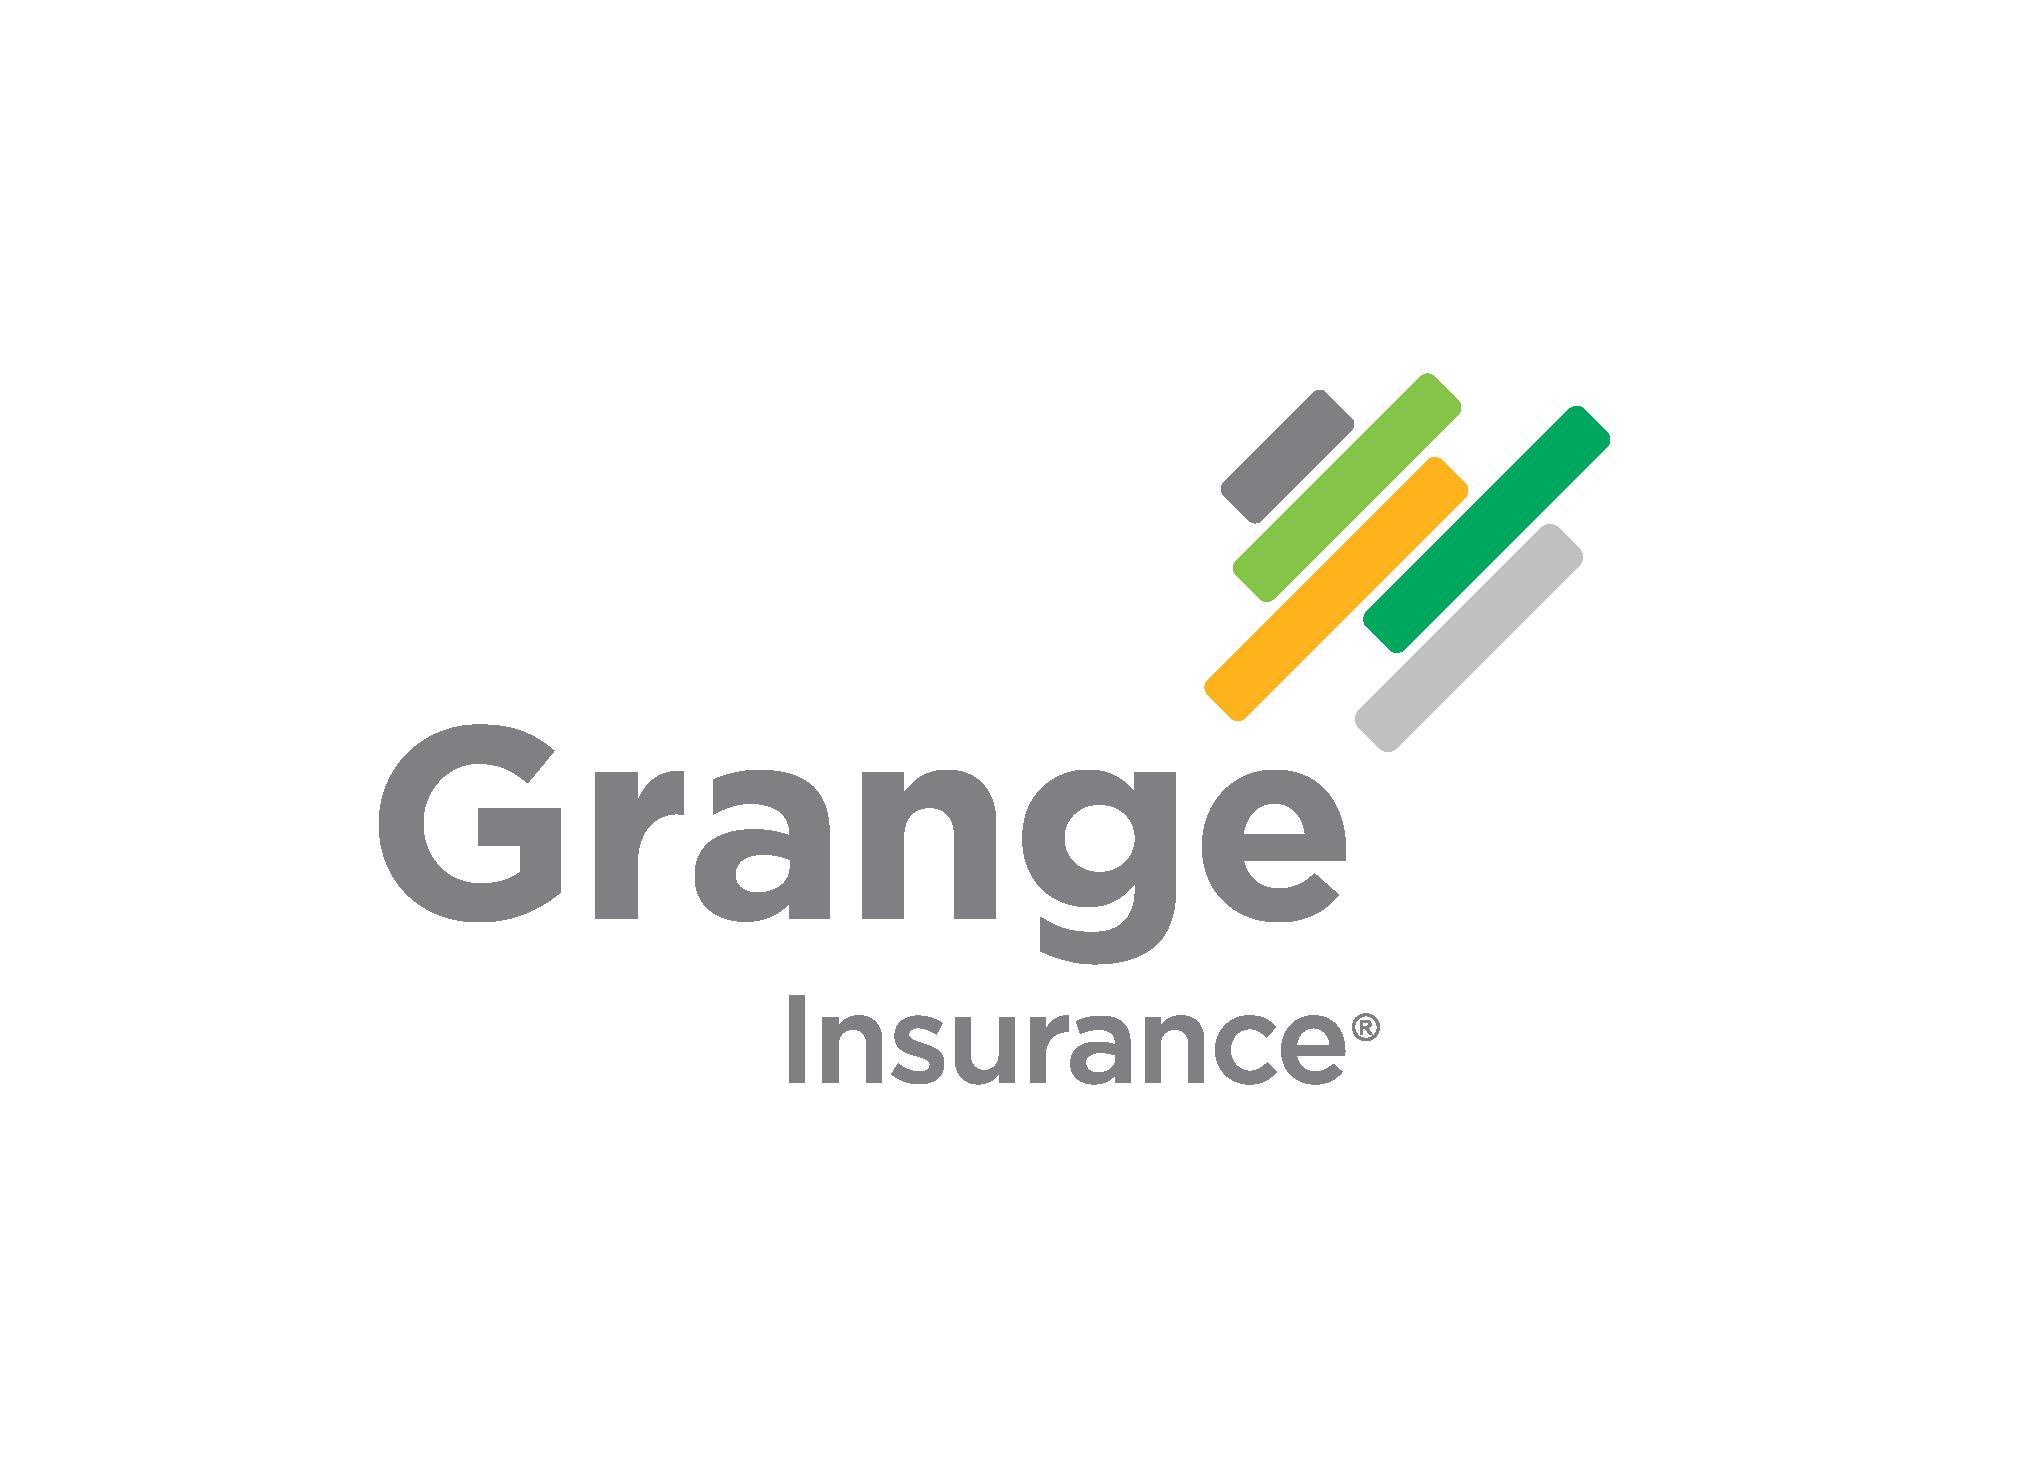 Katherine Ethridge  ethridgek@grangeinsurance.com  C: 615-308-6572  Grange Insurance Corporate Headquarters 671 S. High Street Columbus, OH 43206   grangeinsurance.com   You & Grange: Committed. Connected. Partners.